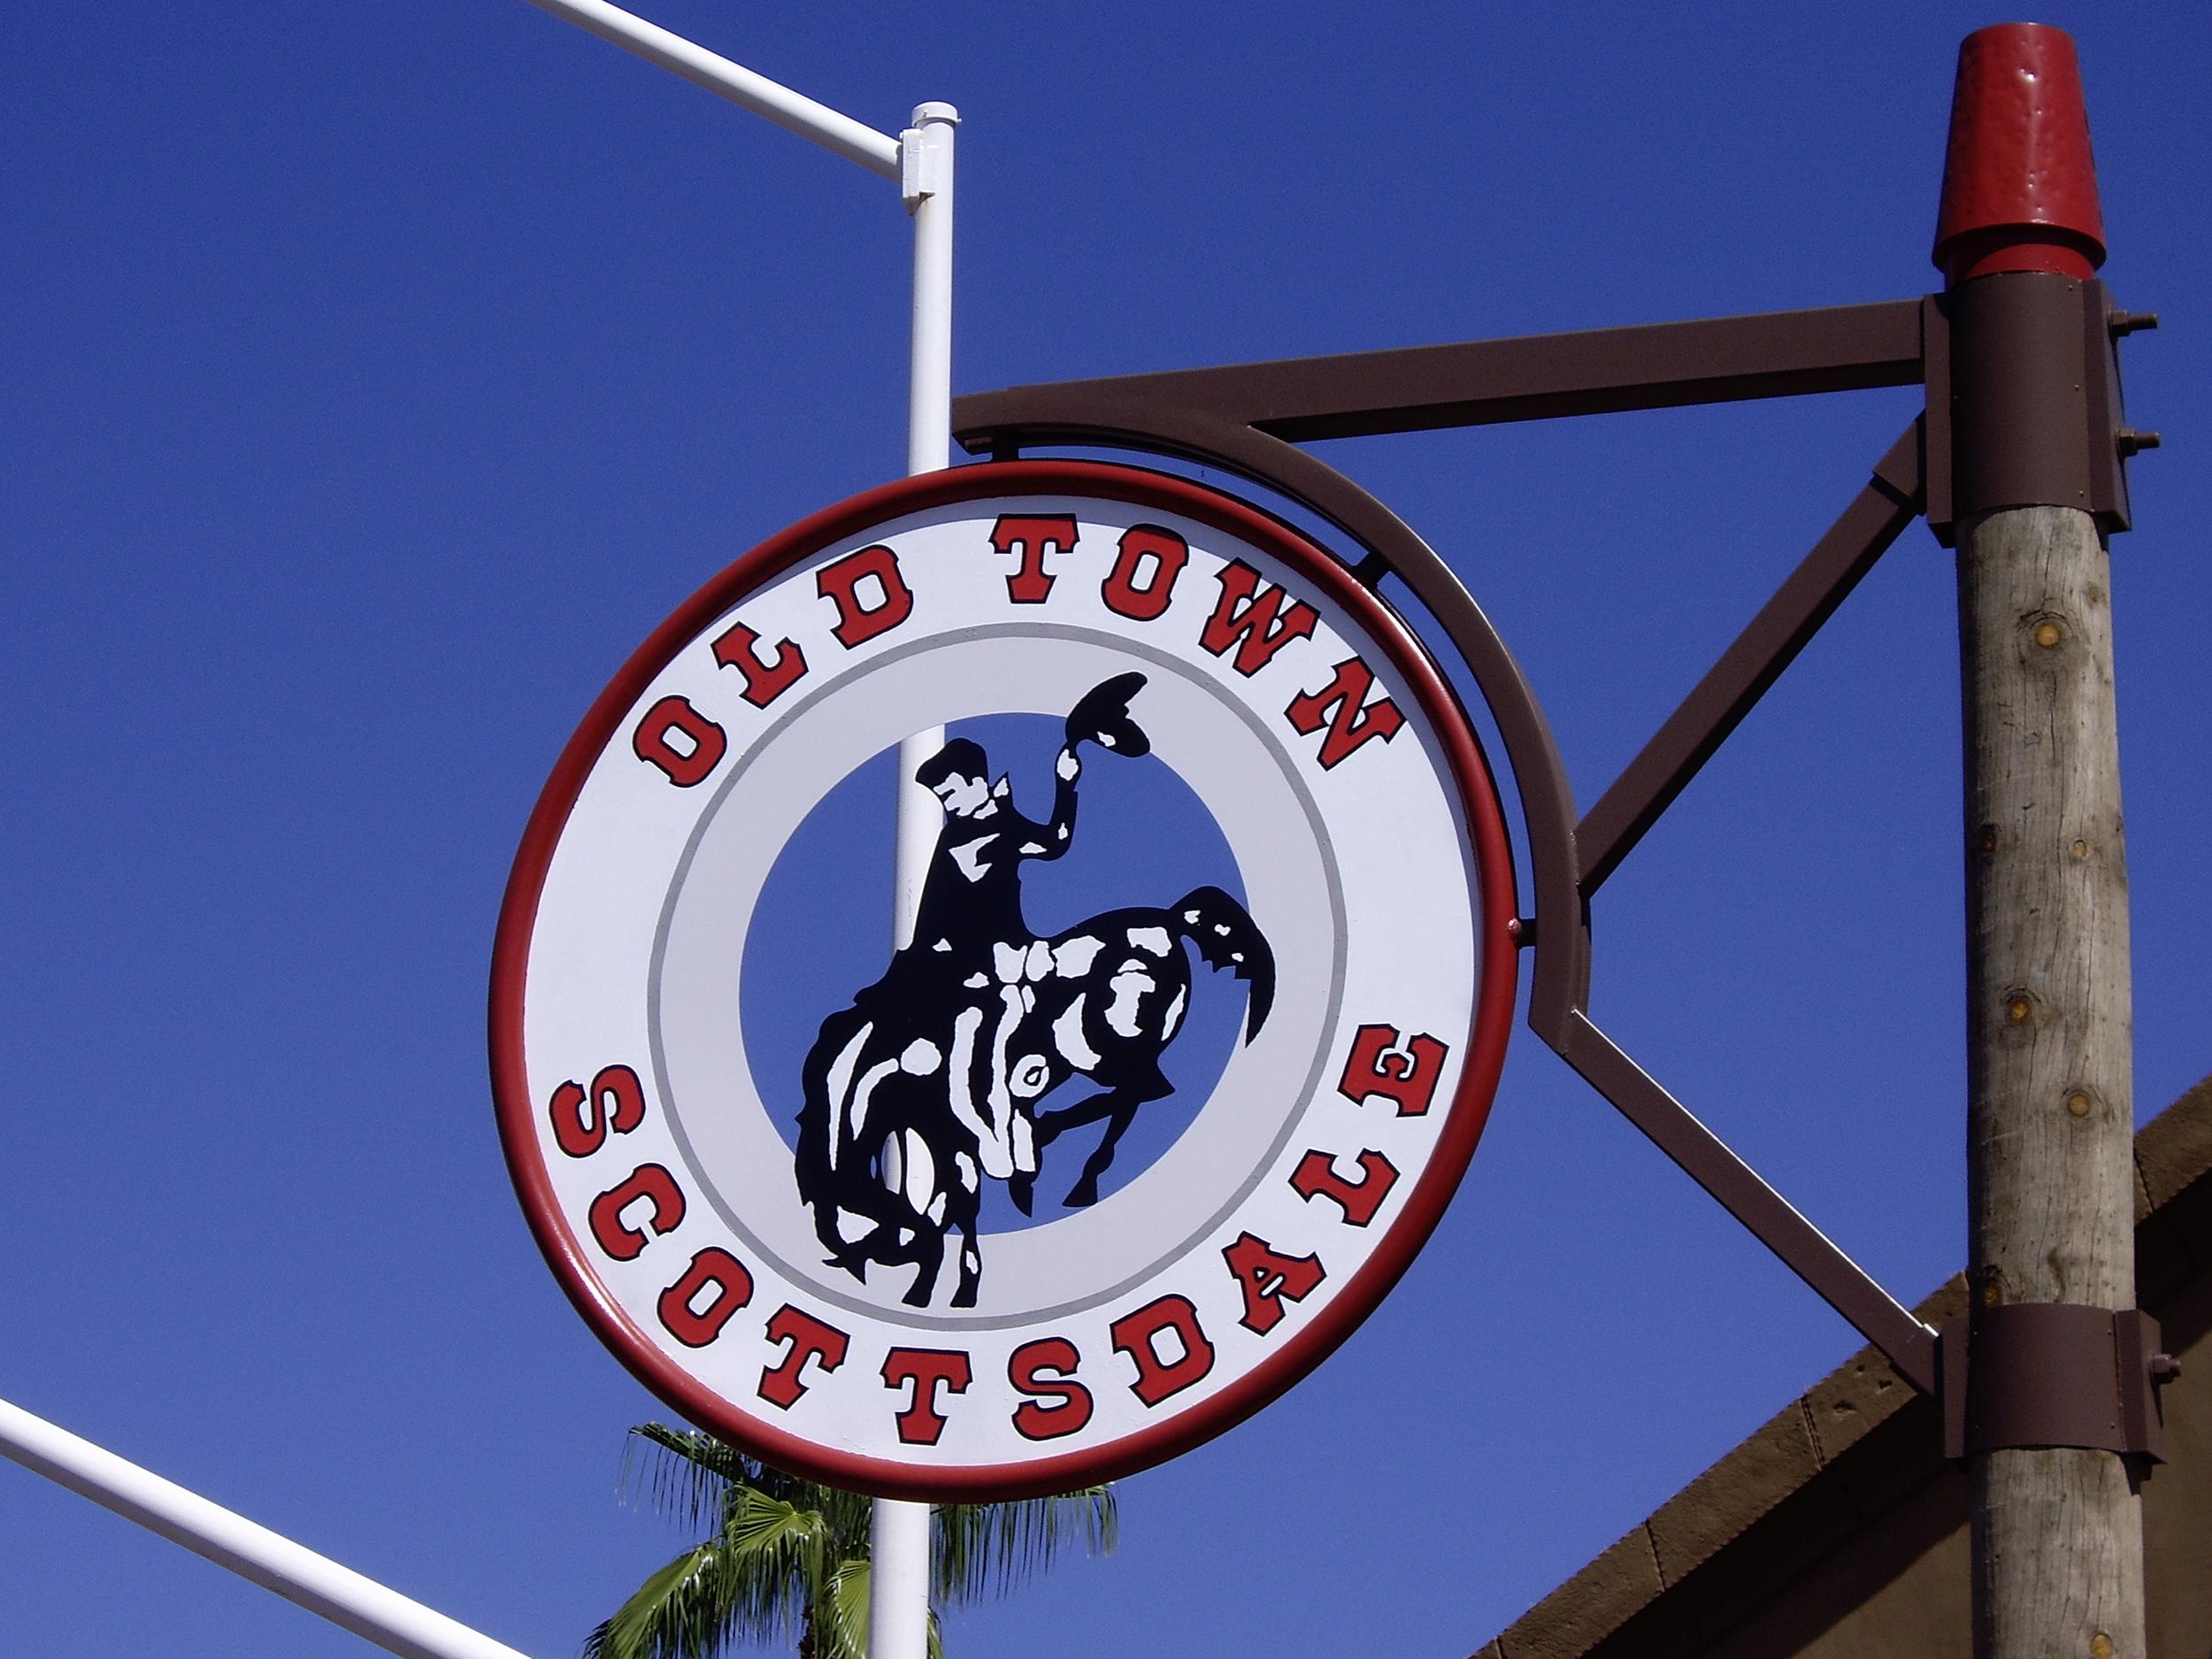 Åtta favoritplatser i USA old town scottsdale